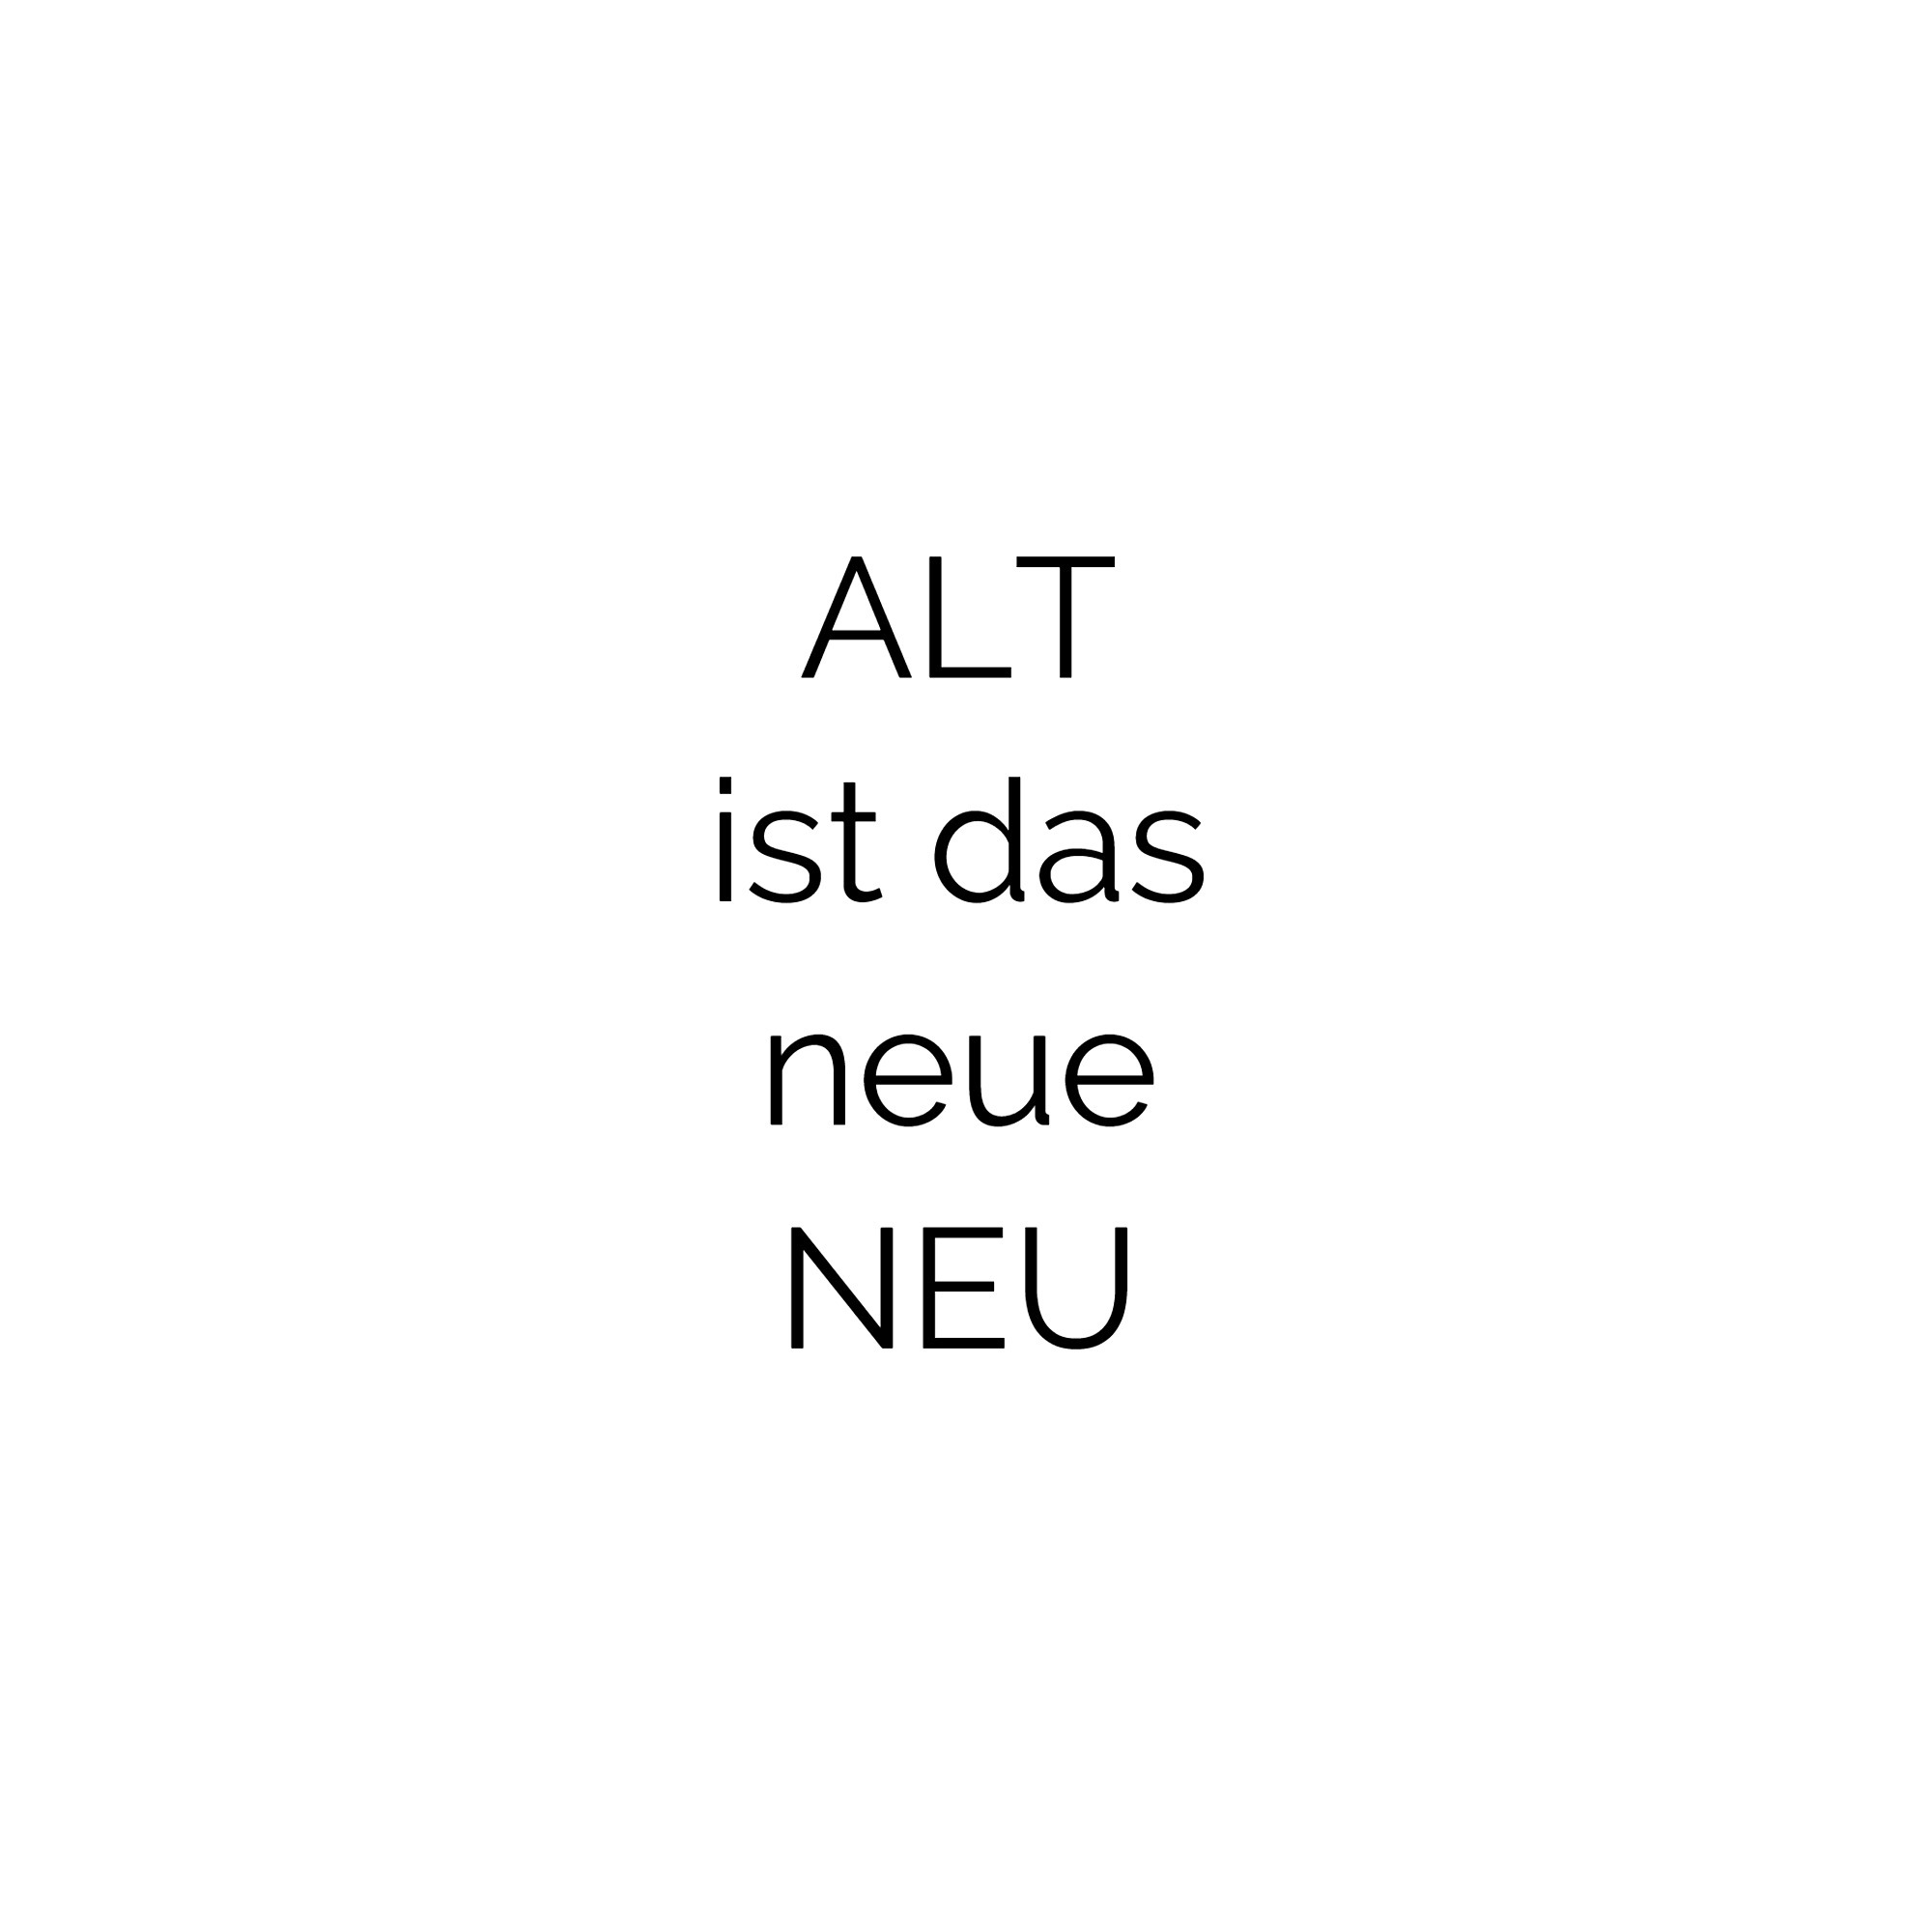 2nd life_AltNeu